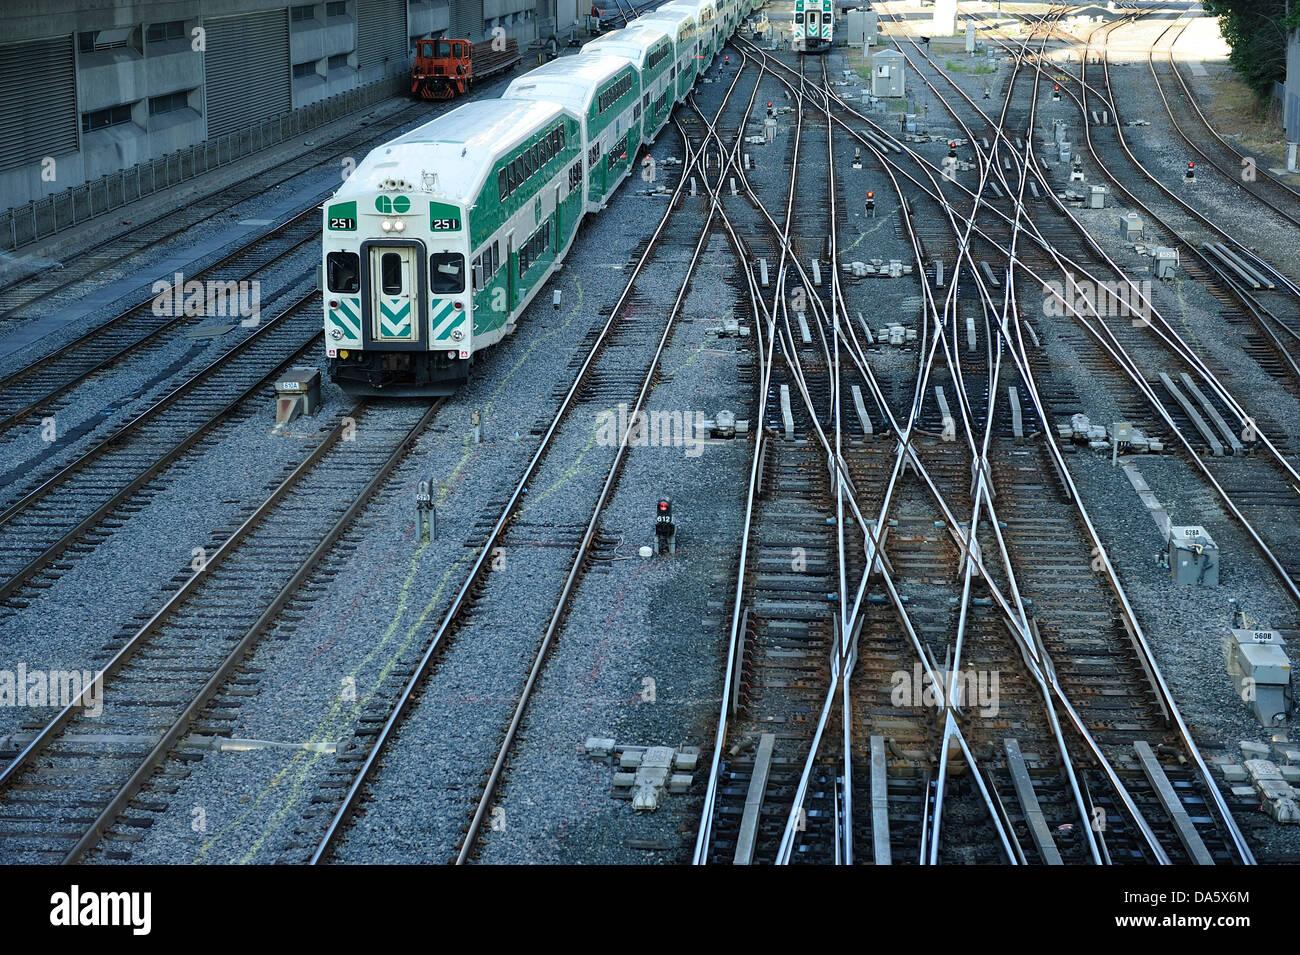 Railway tracks, train, downtown, Ontario, Canada, railway, traffic, Toronto, - Stock Image